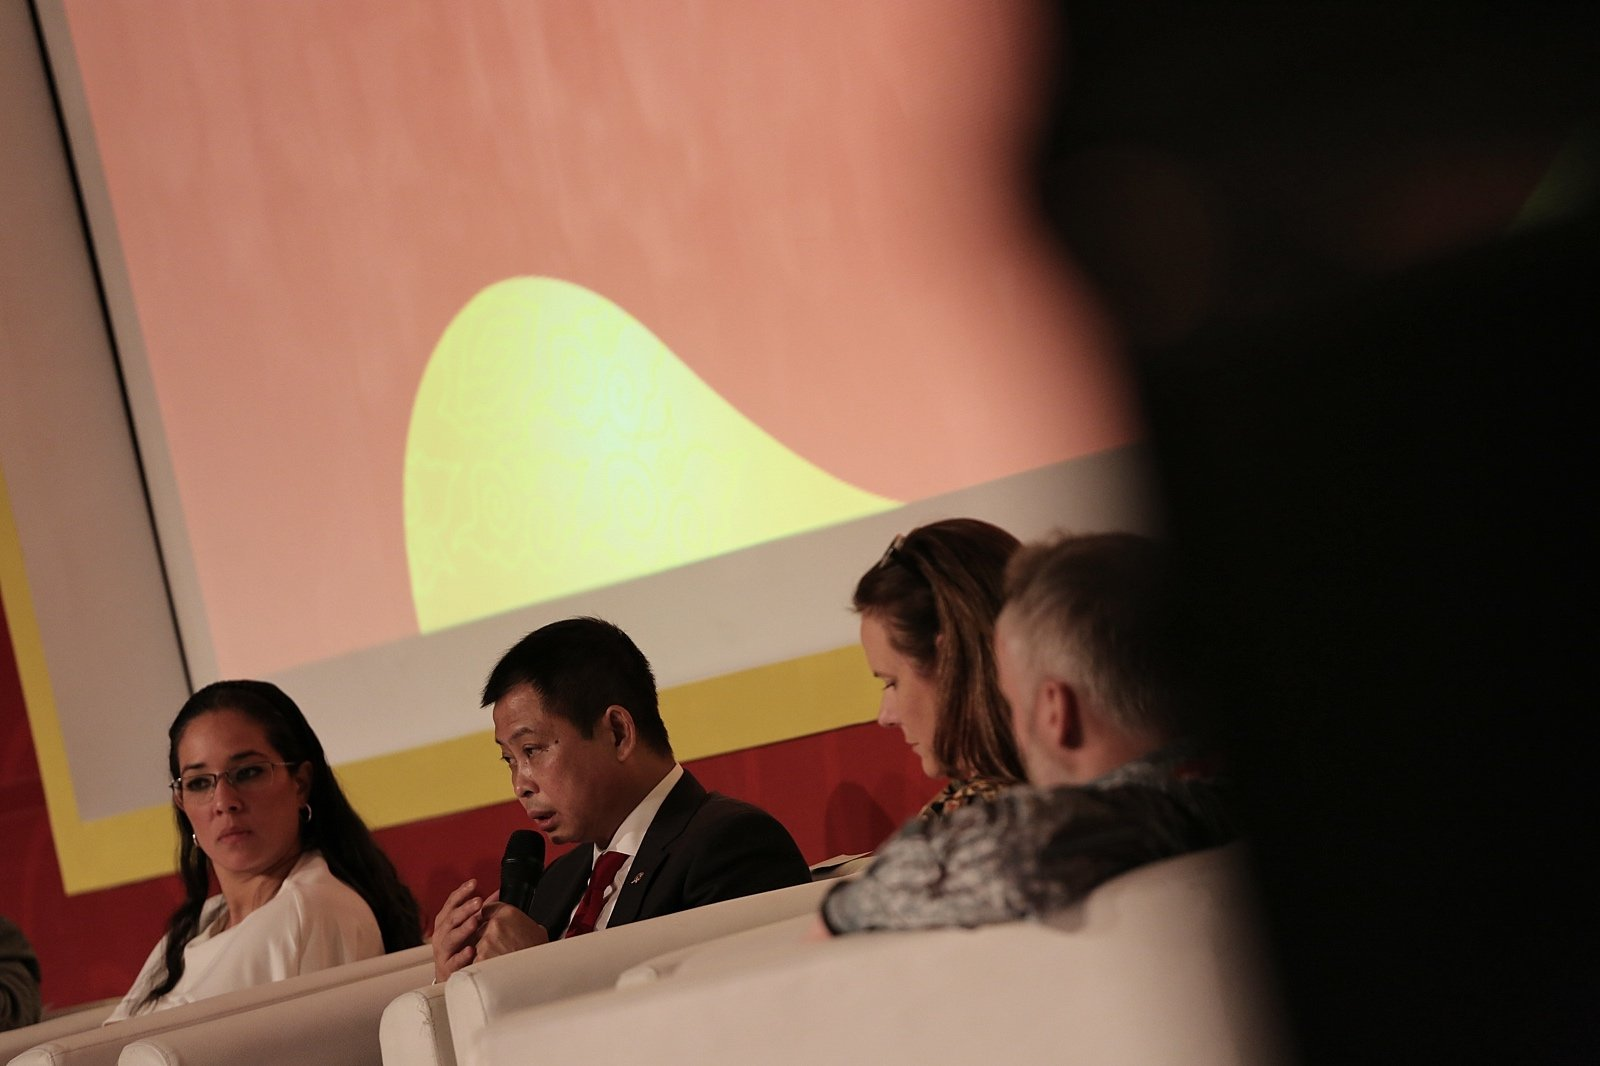 Sesi diskusi konvensi IPA Convex 2017 bersama Menteri ESDM Ignasius Jonan di Jakarta, Rabu (17/5).